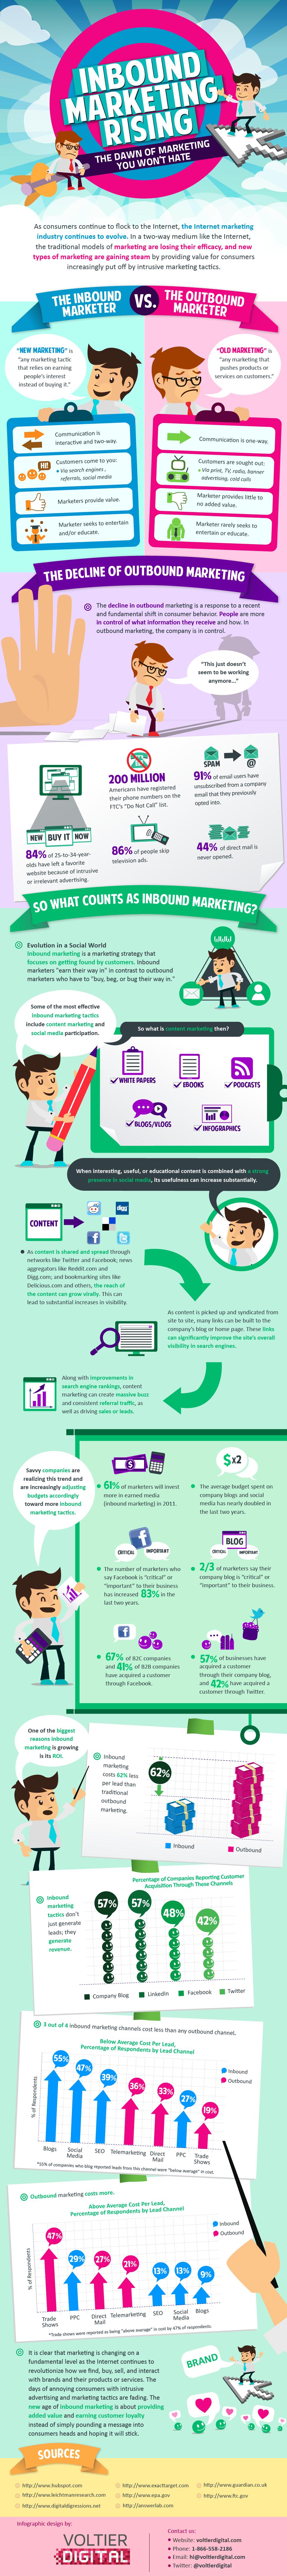 Infographic courtesy: Voltier Digital